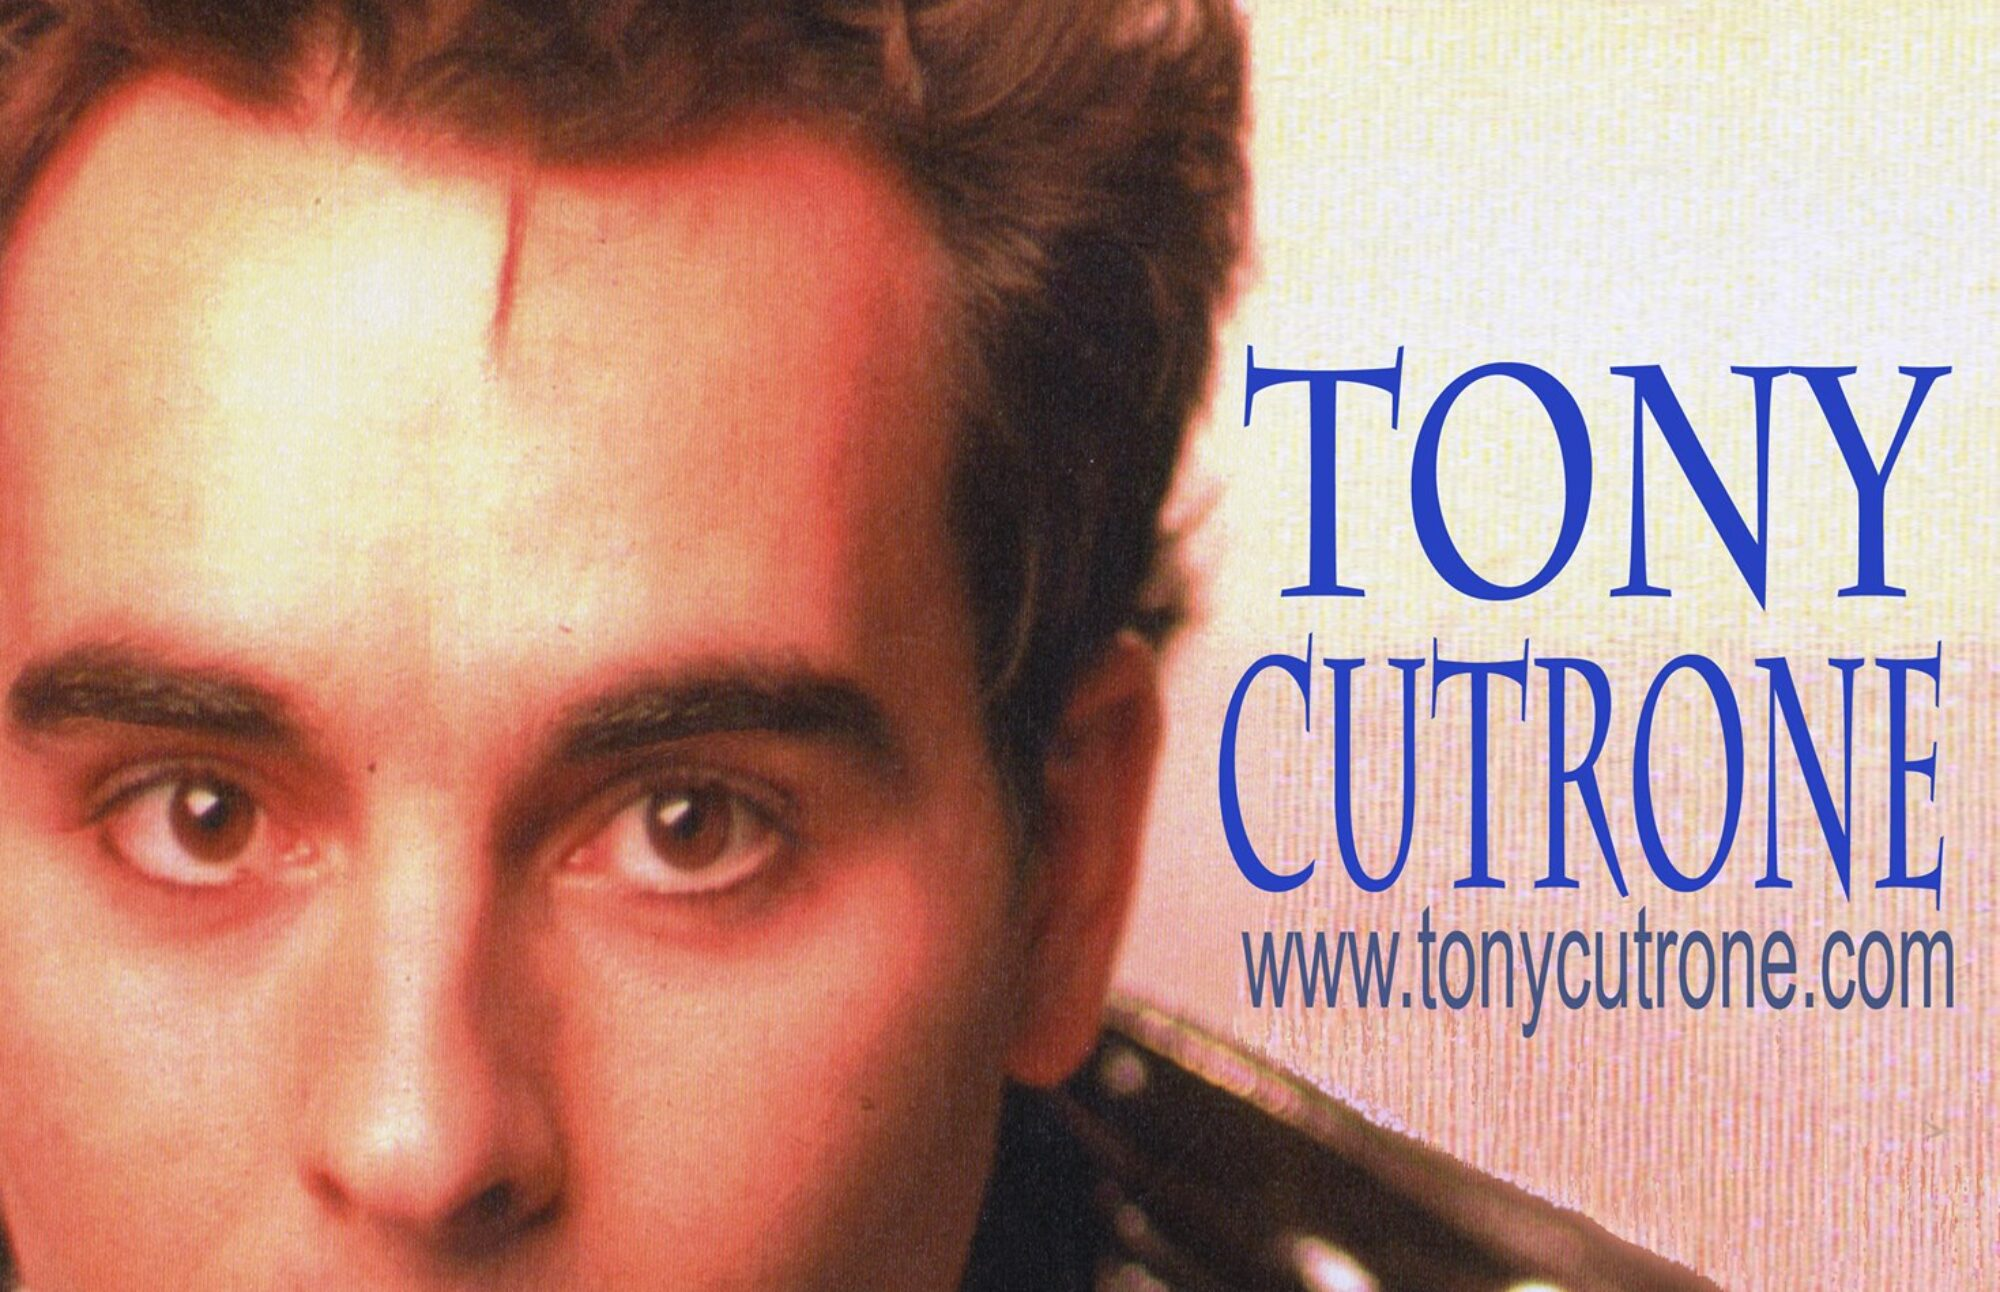 Tony Cutrone